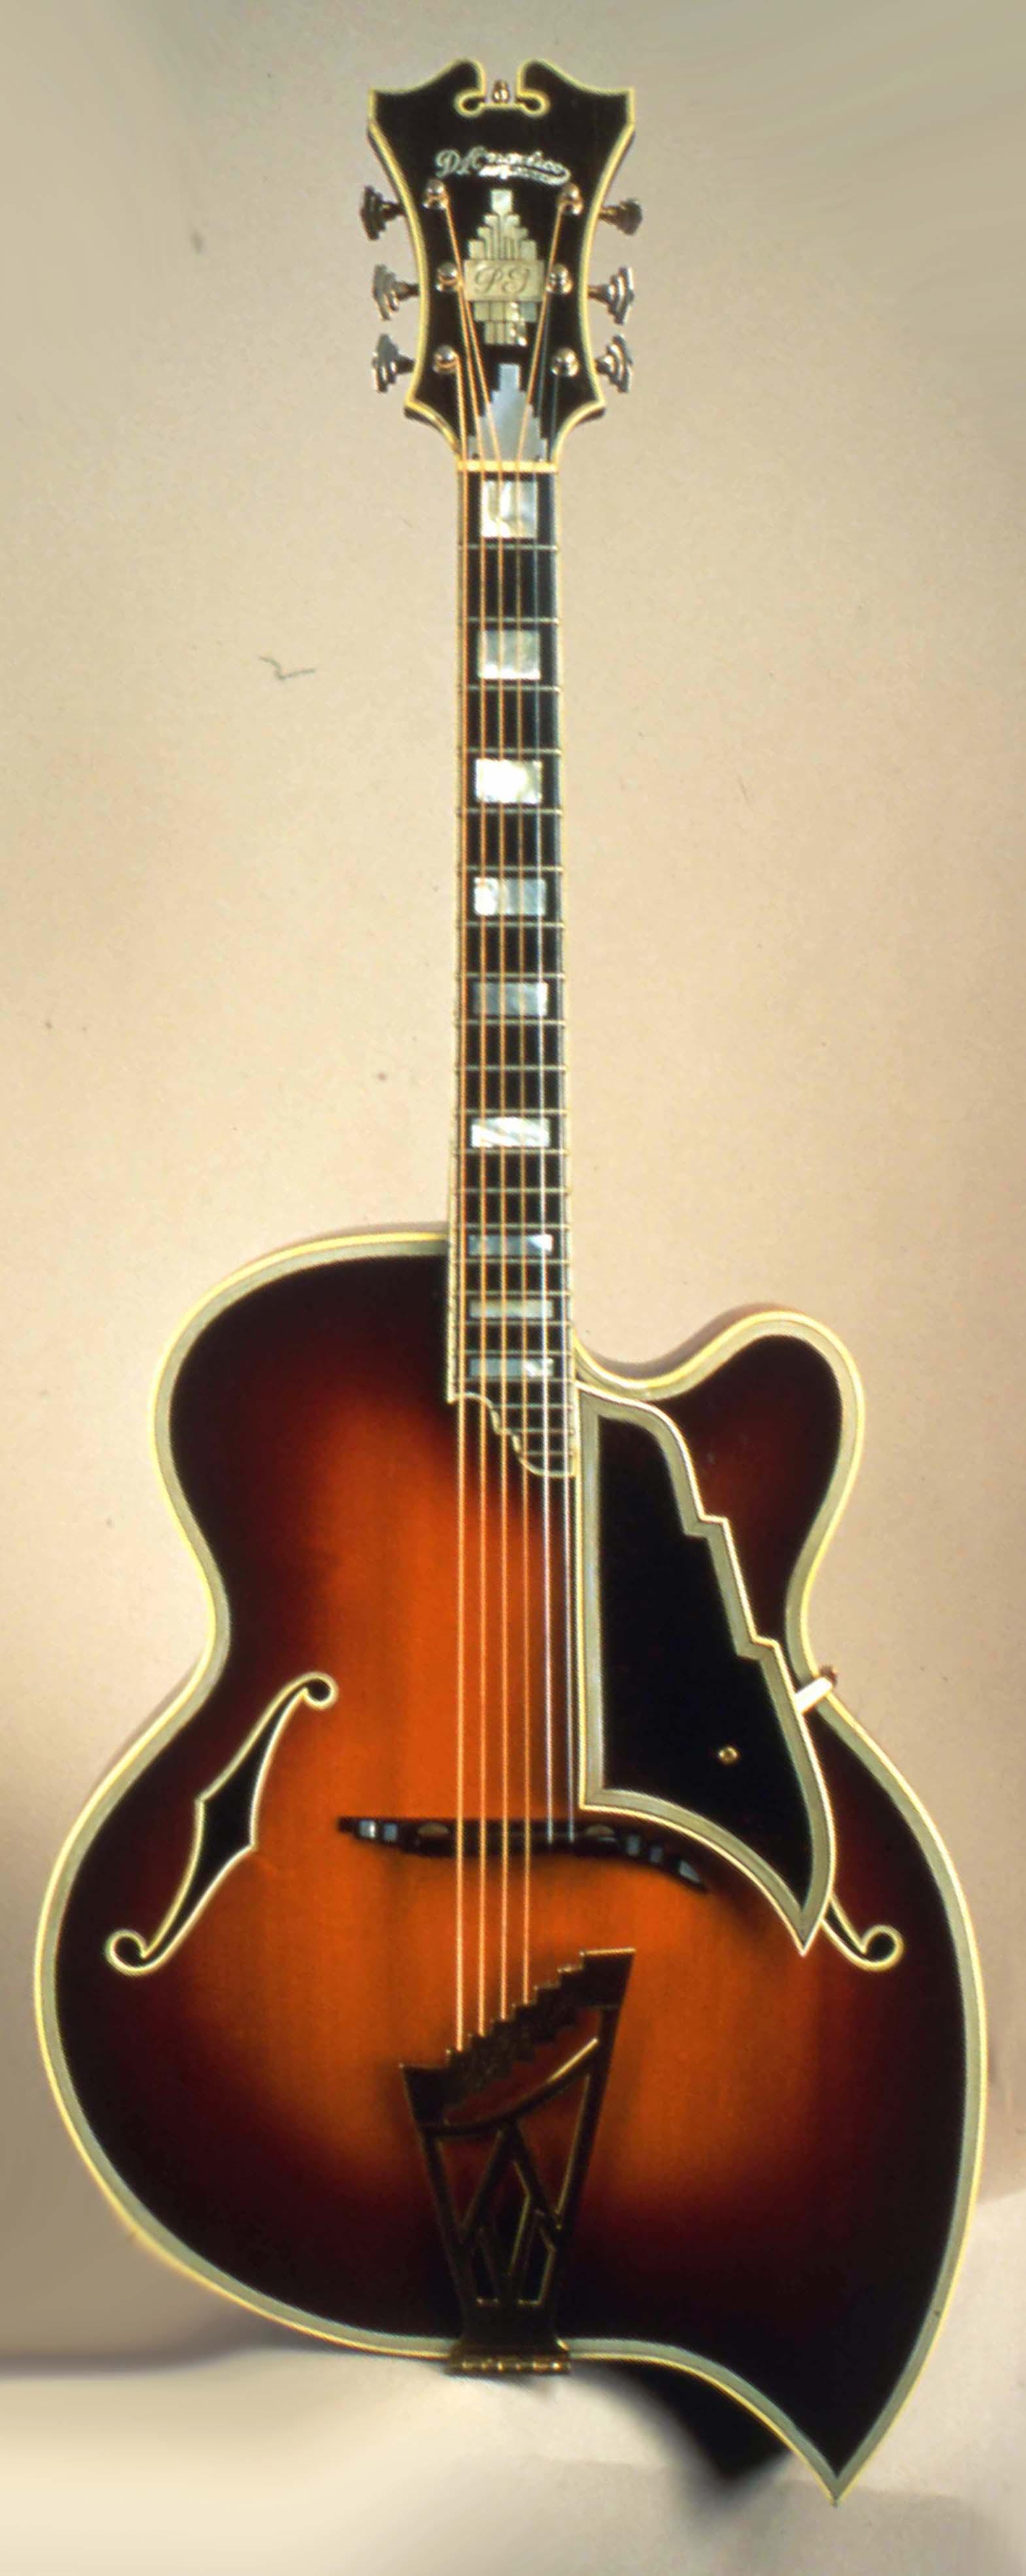 "Photo of the D""Angelico Teardop Guitar"